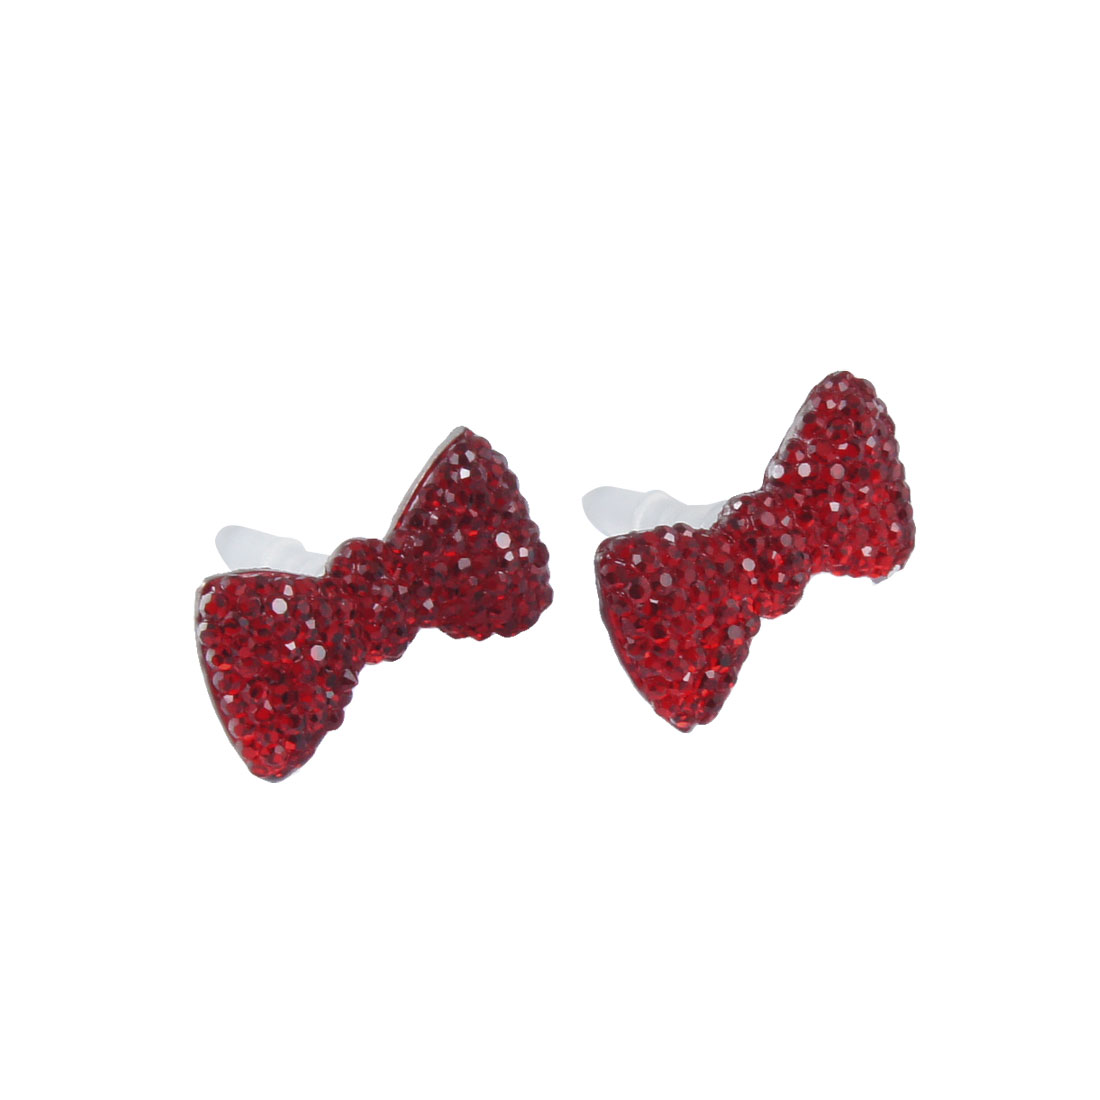 2 Pcs Bling Red Crystal Bow 3.5mm Anti Dust Earphone Ear Cap Plug